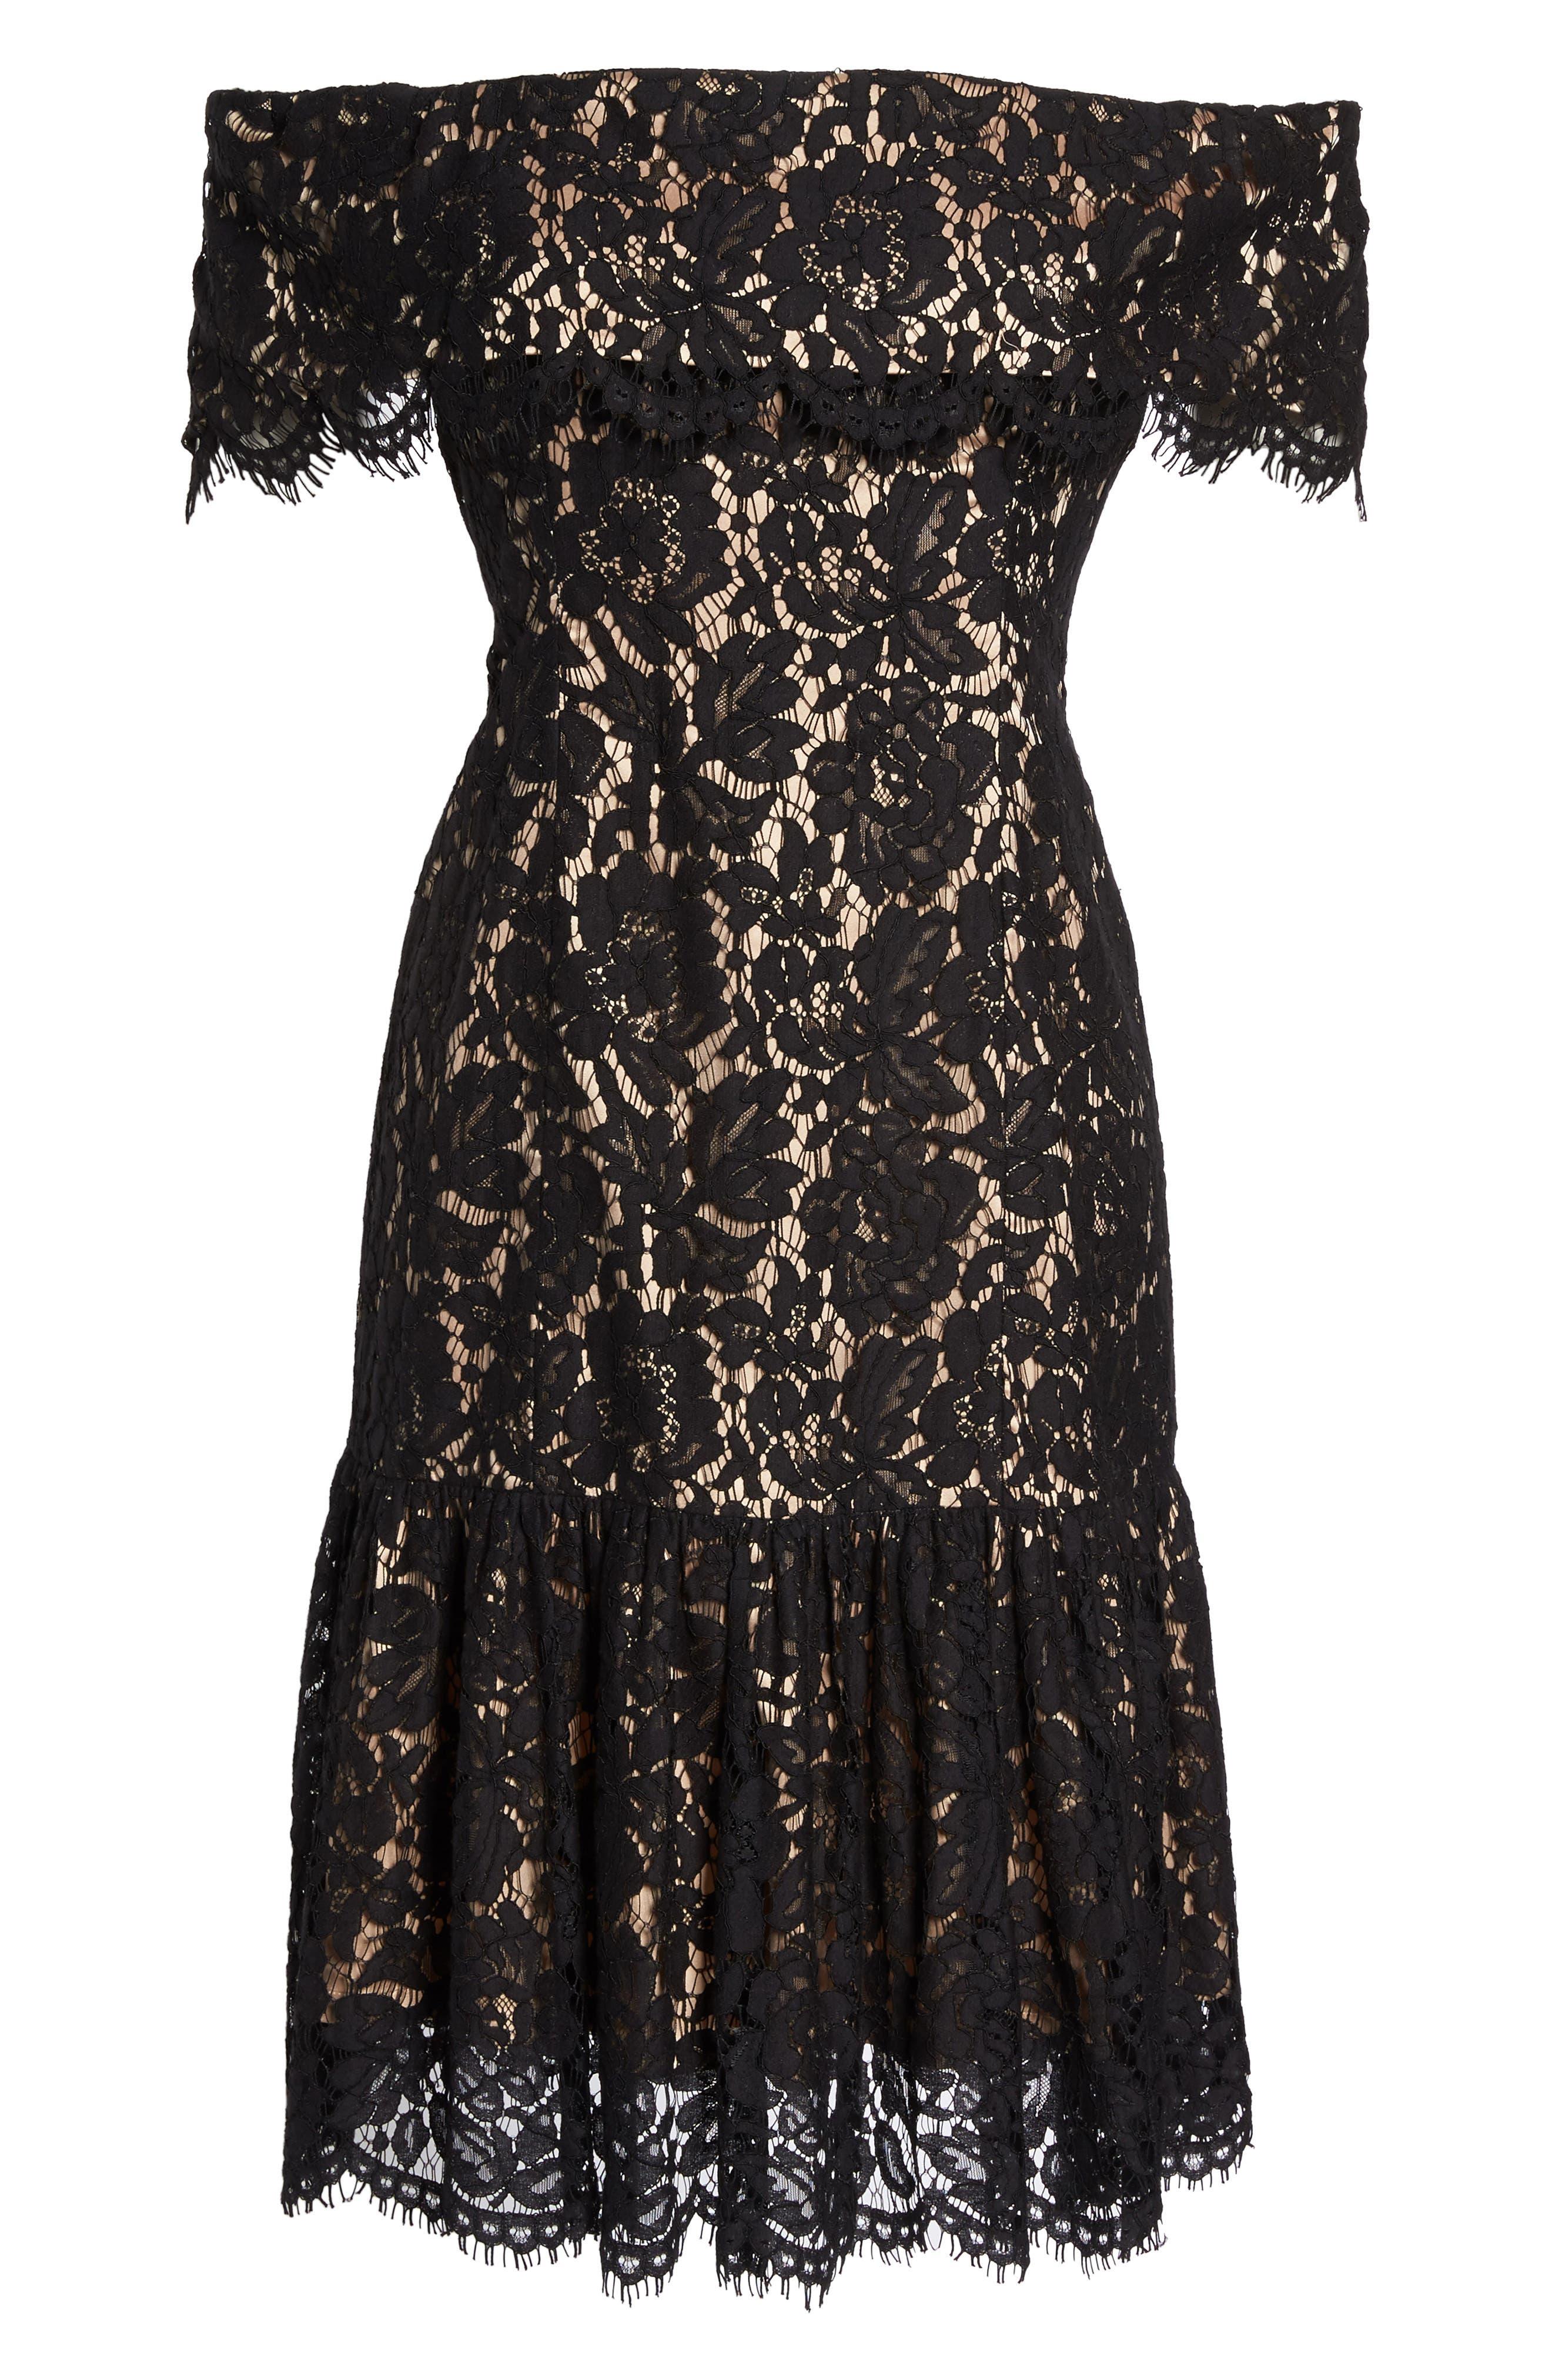 Lace Off the Shoulder Midi Dress,                             Alternate thumbnail 6, color,                             001